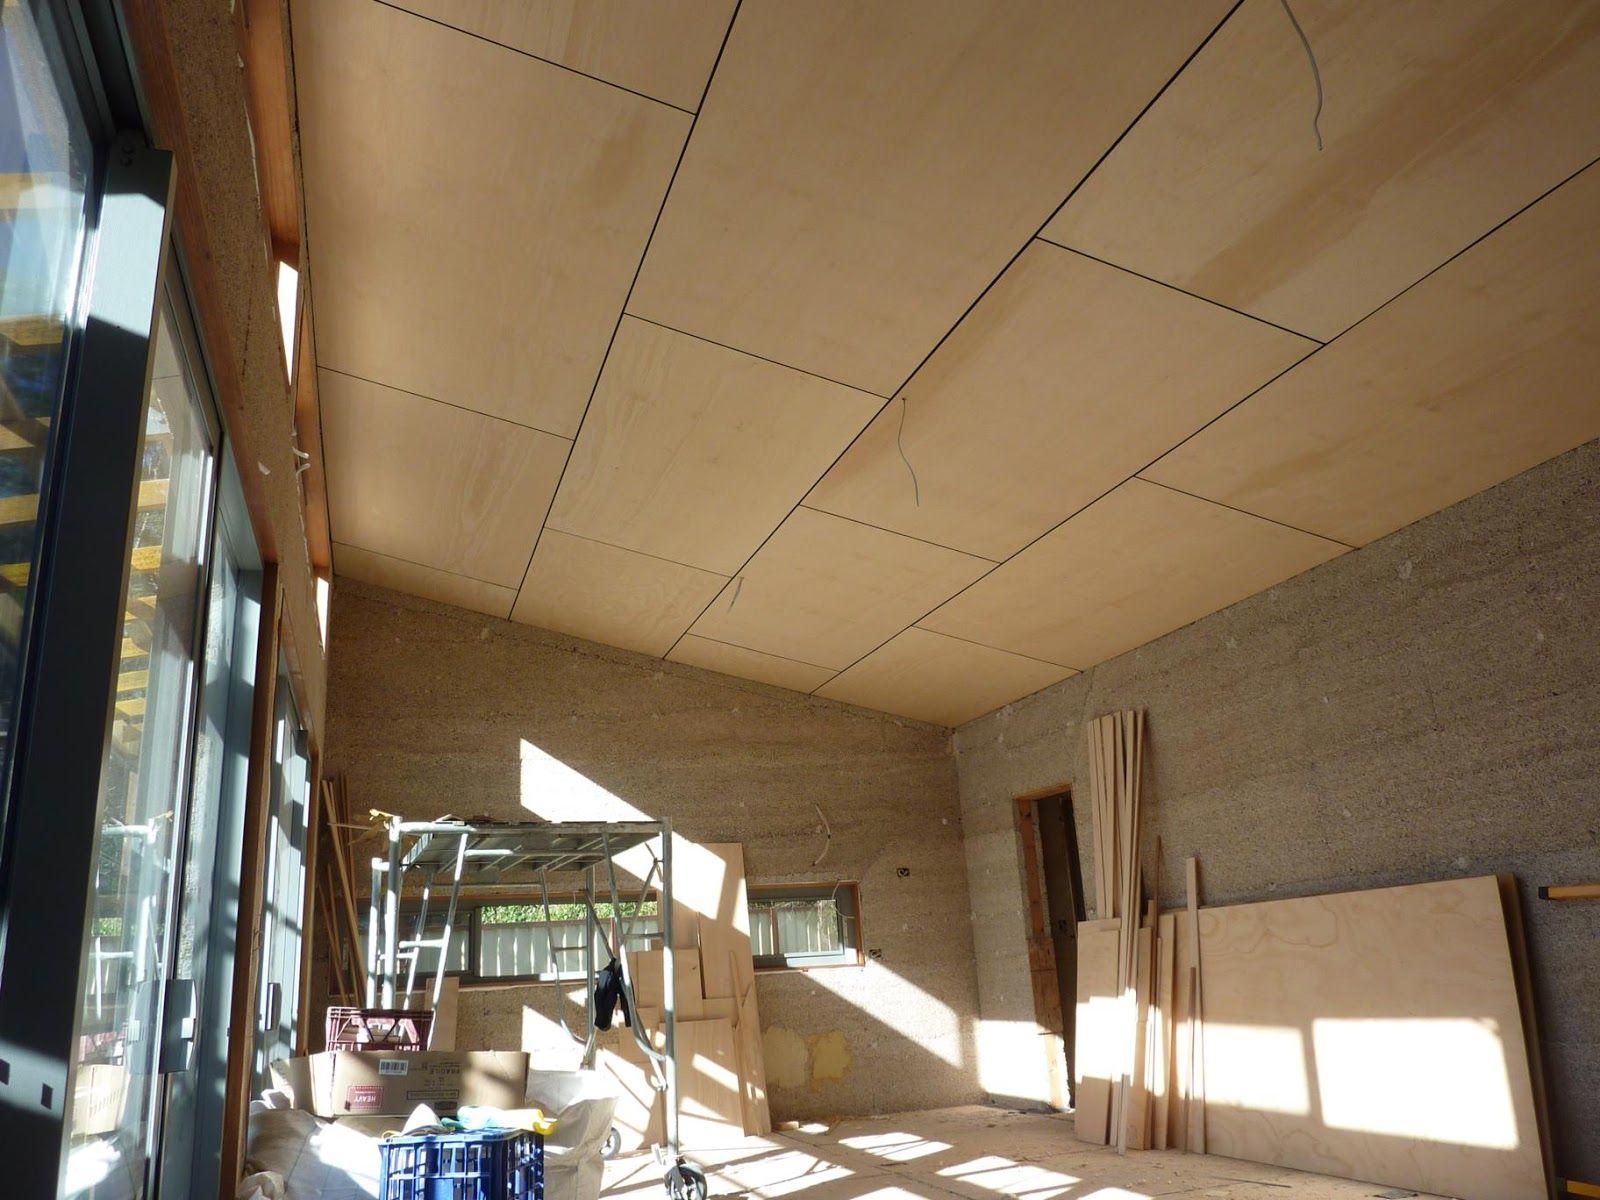 culburra hemp house: ceilings and internal walls completed | dream